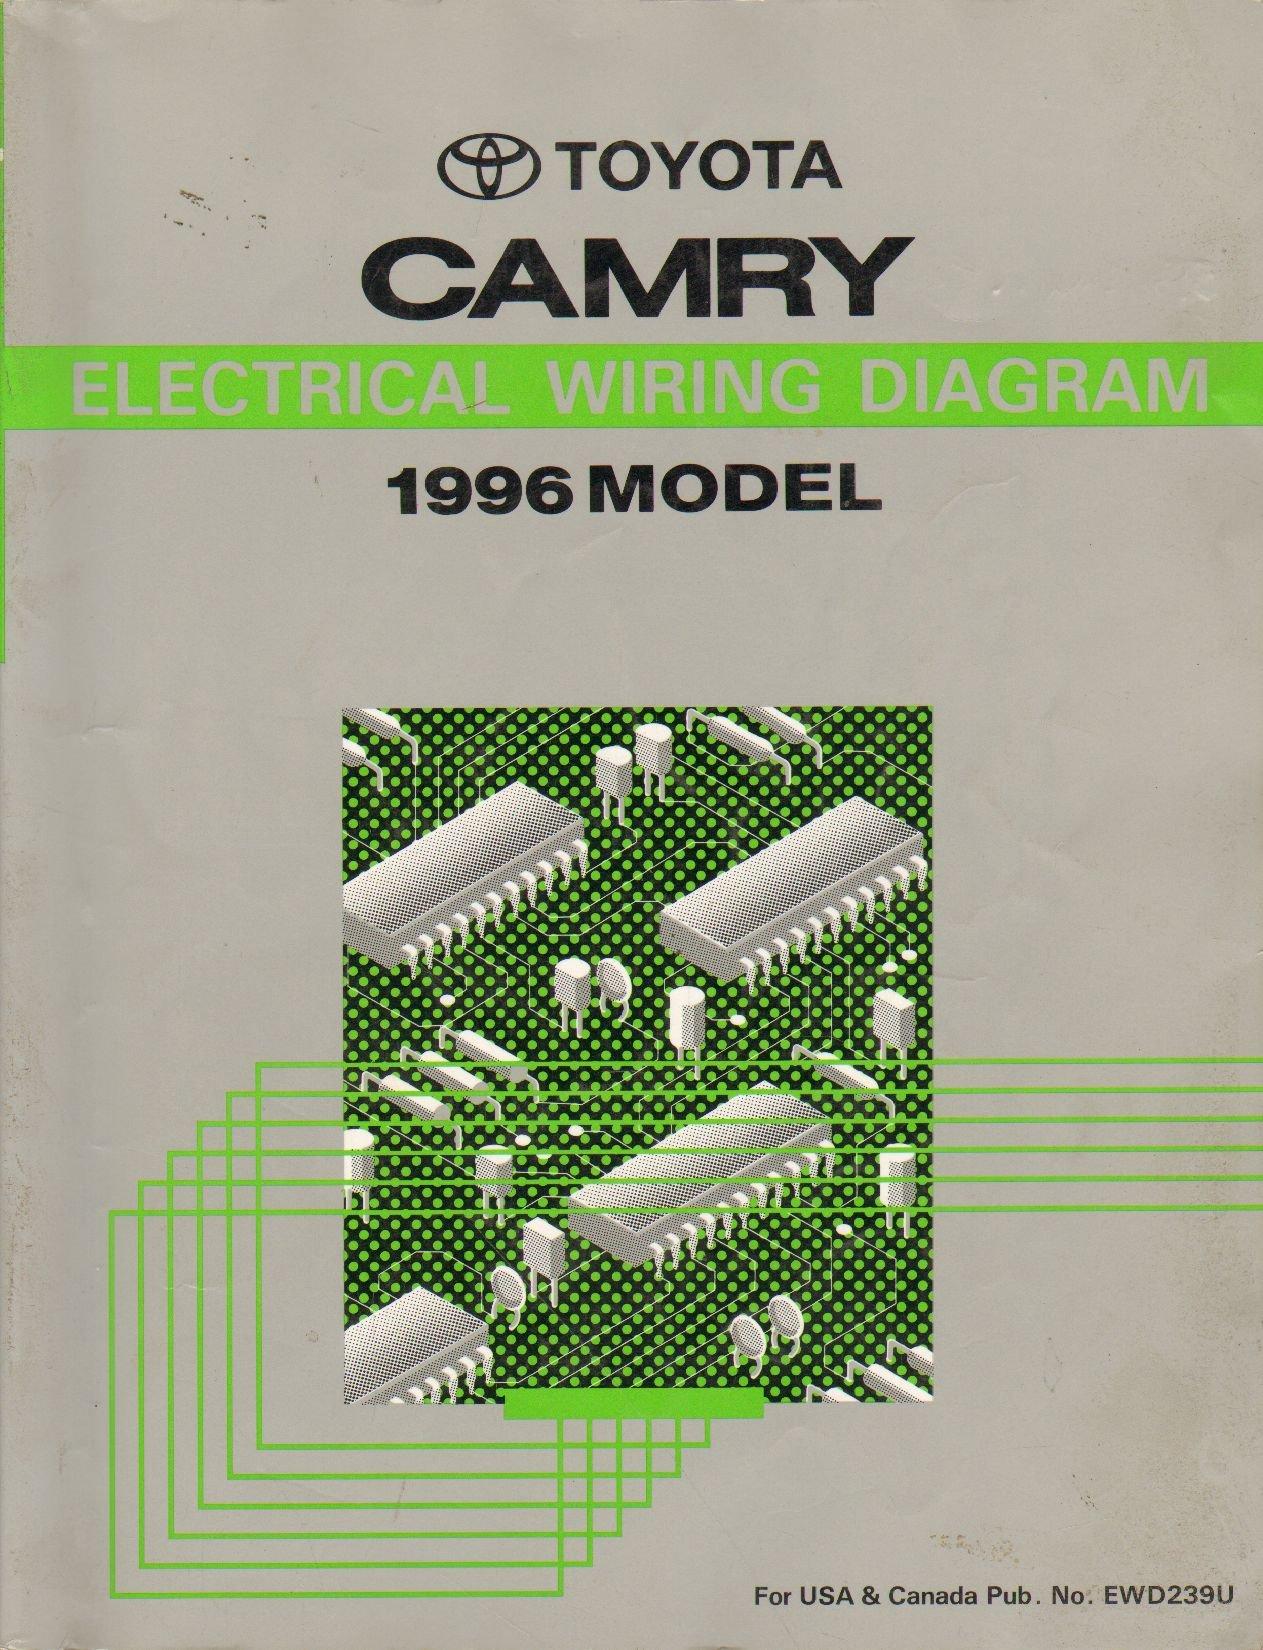 1996 Toyota Camry Electrical Wiring Diagram Shop Manual: toyota:  Amazon.com: BooksAmazon.com